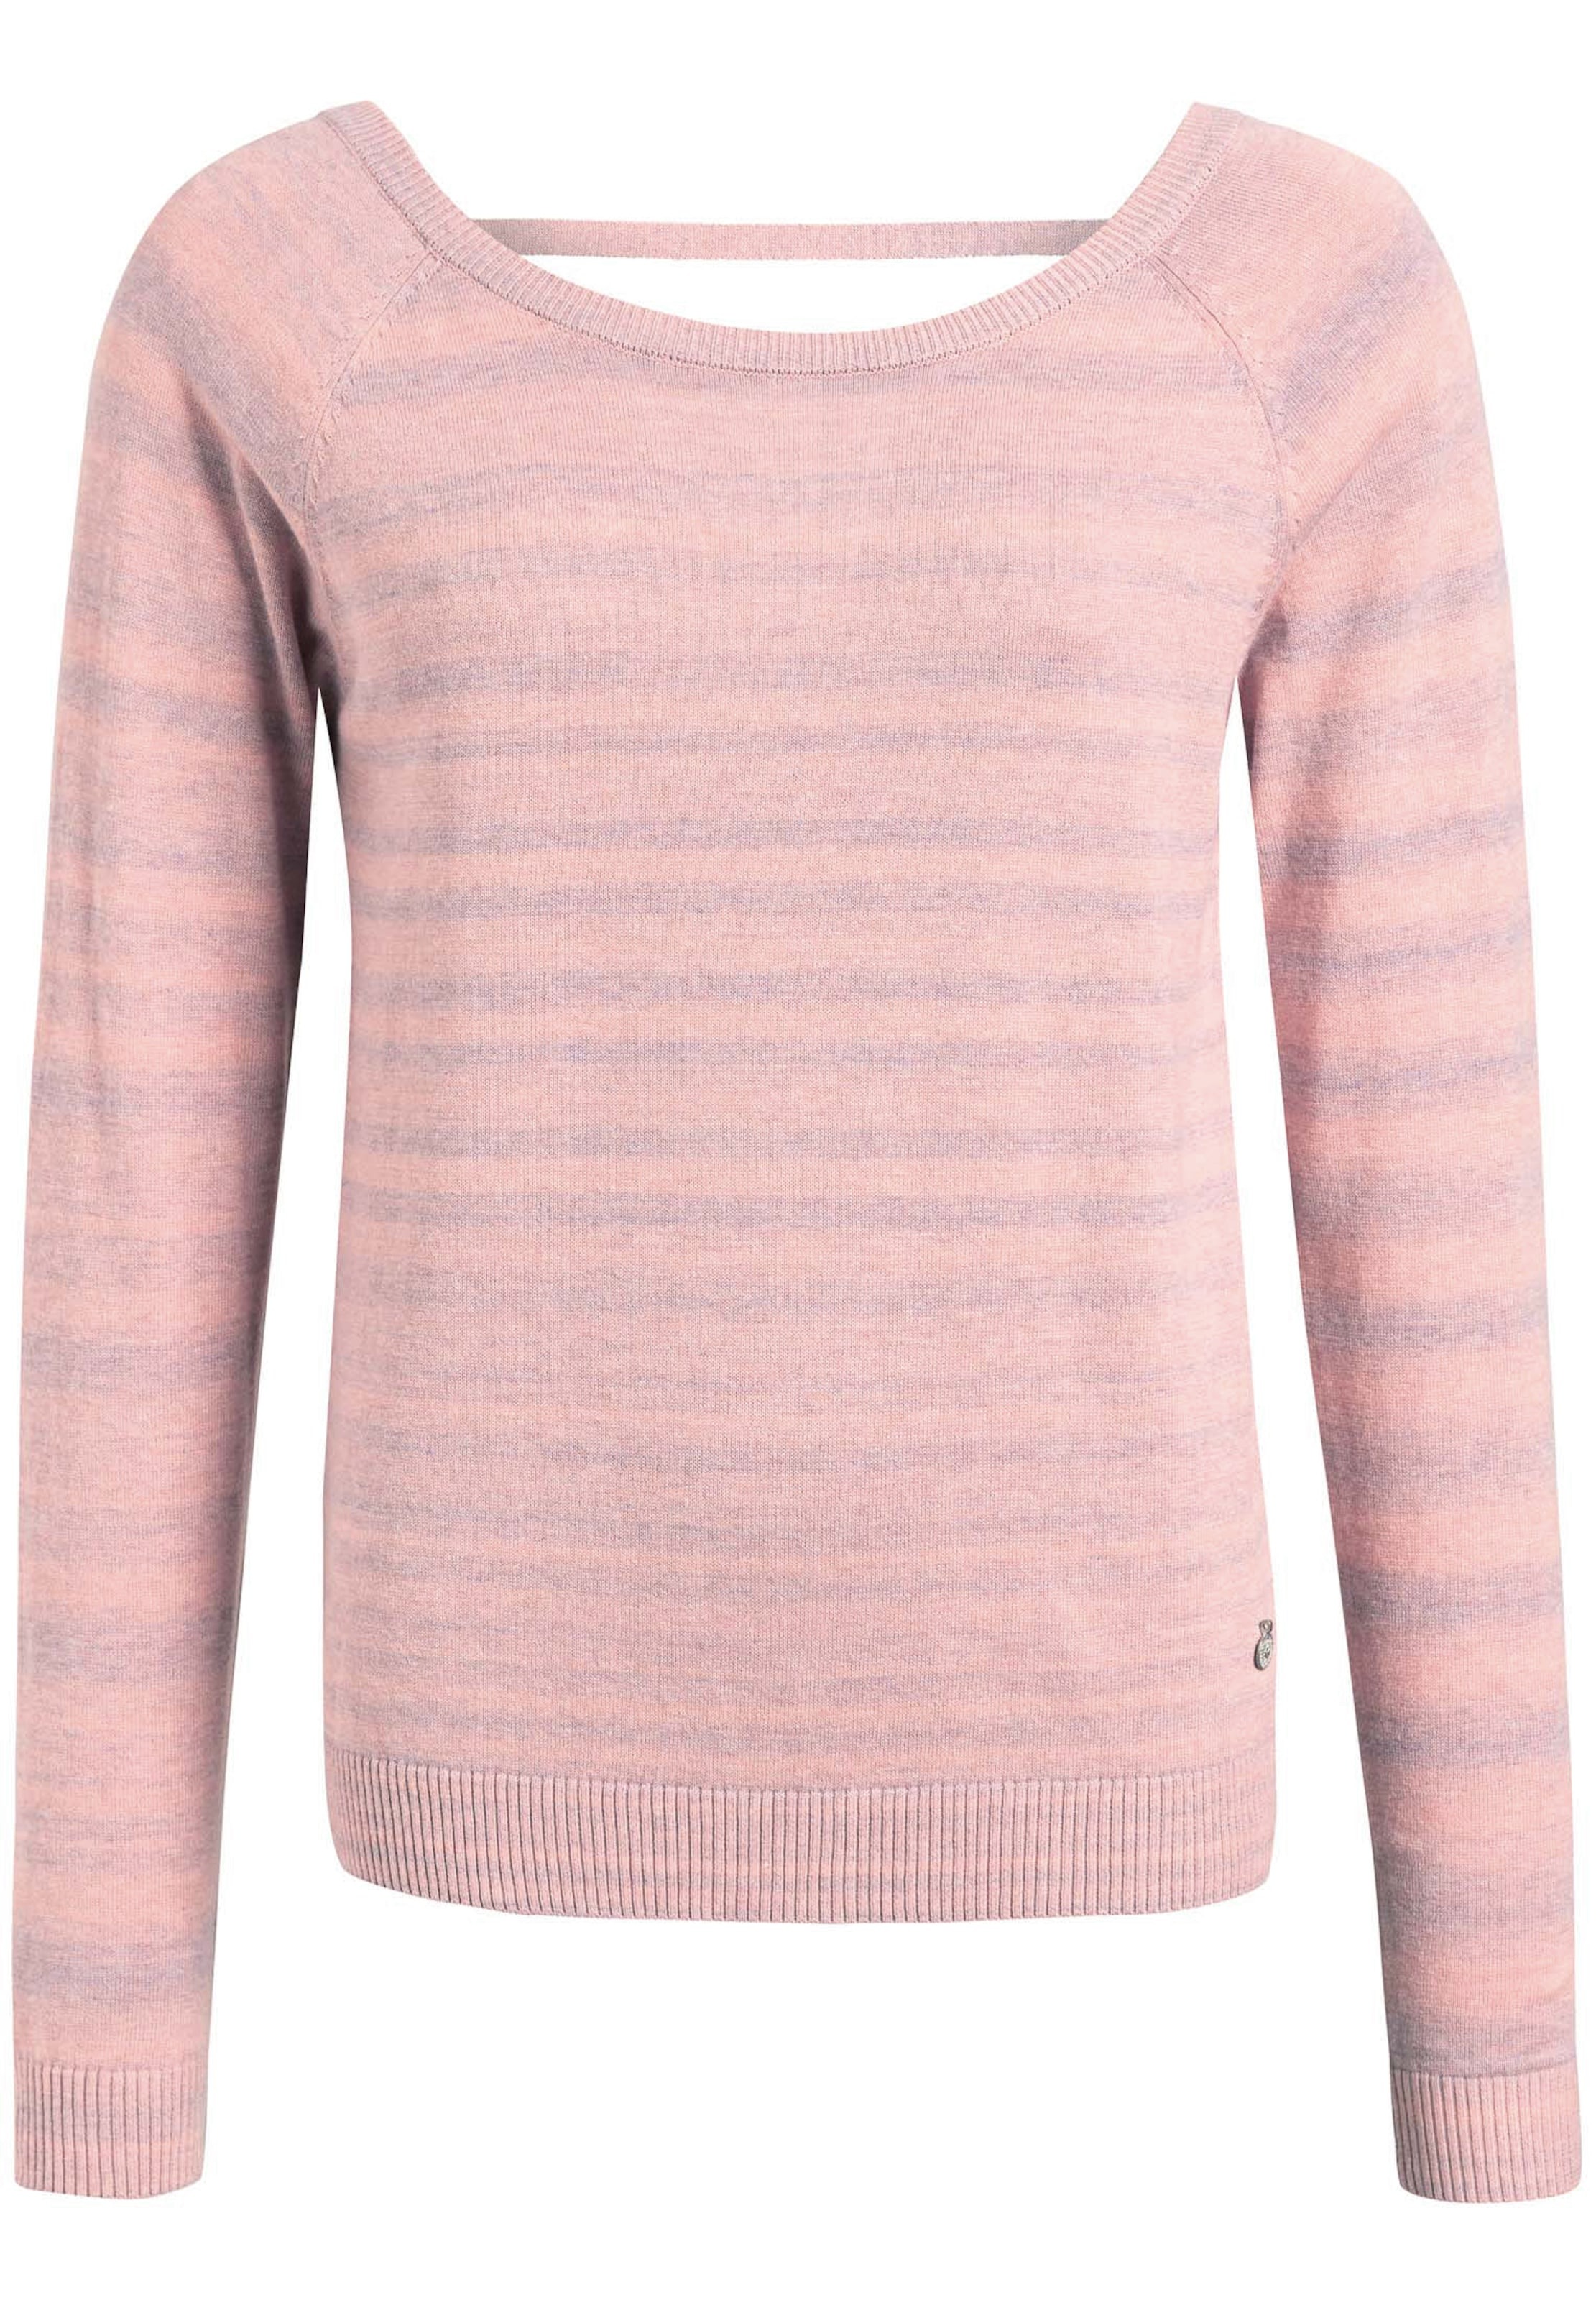 'jilt' Pullover In Khujo FliederAltrosa reCxodBW